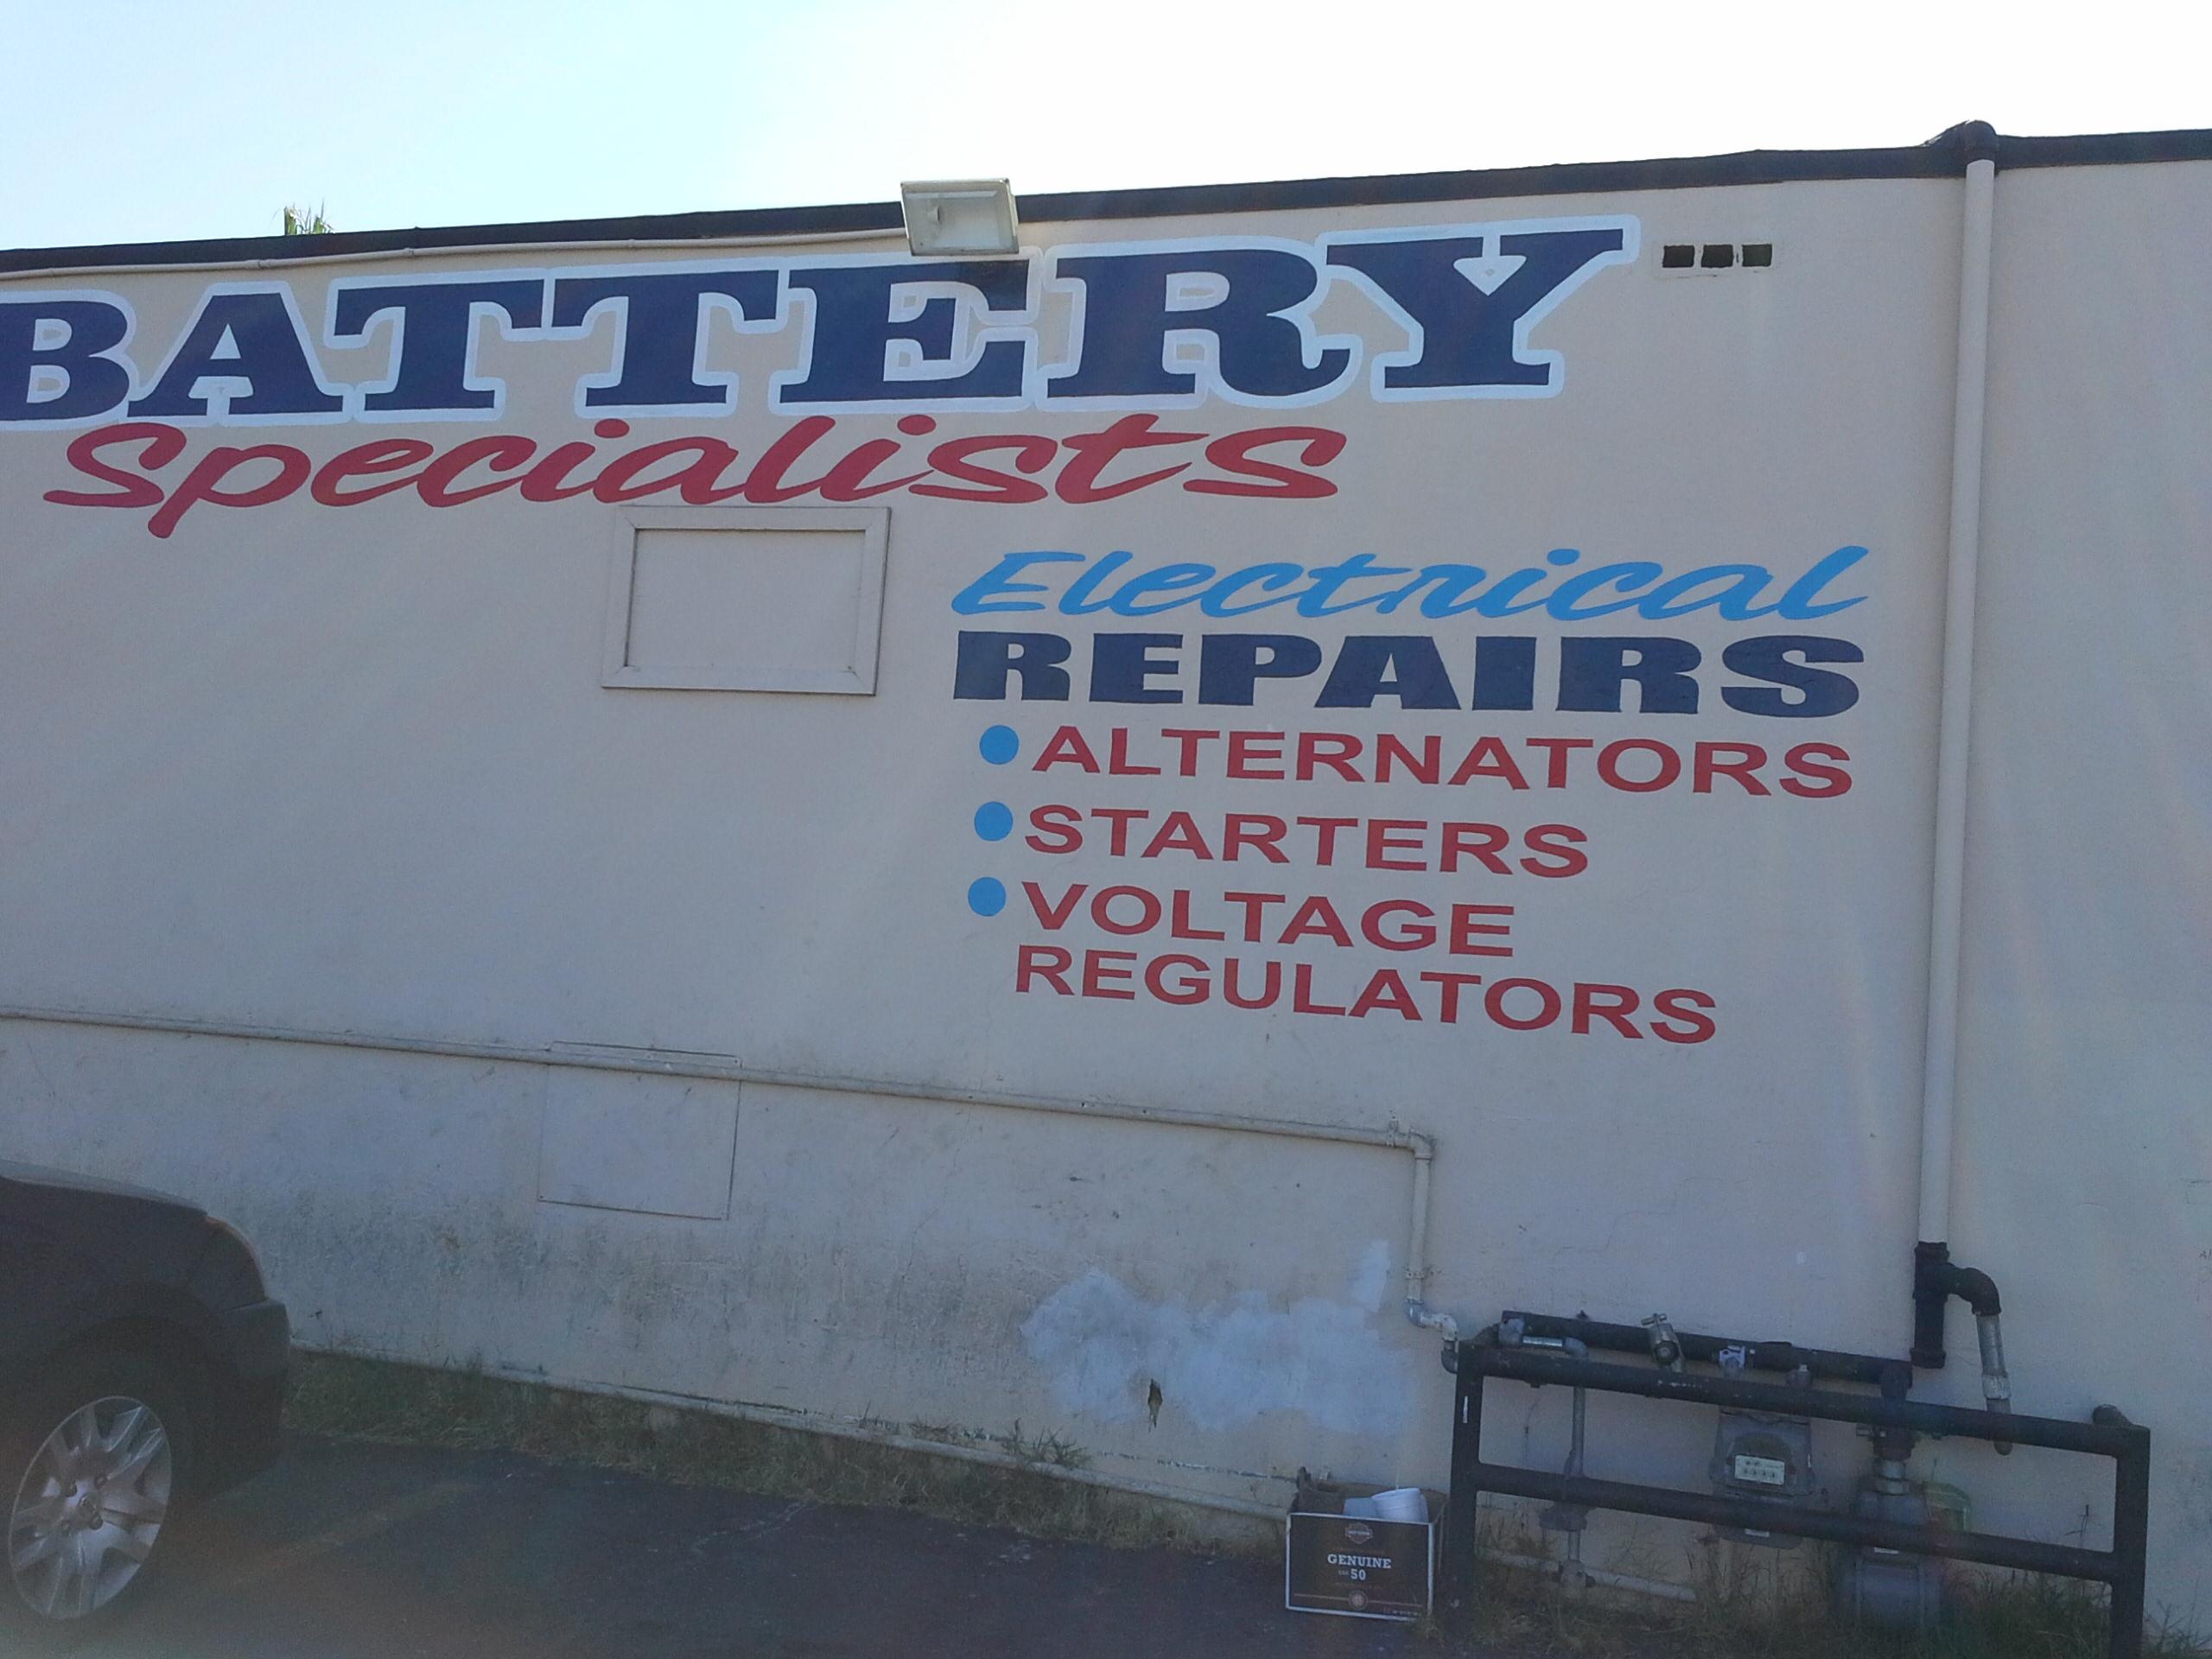 Battery Specialist 1070 E Main St El Cajon, CA Auto Parts